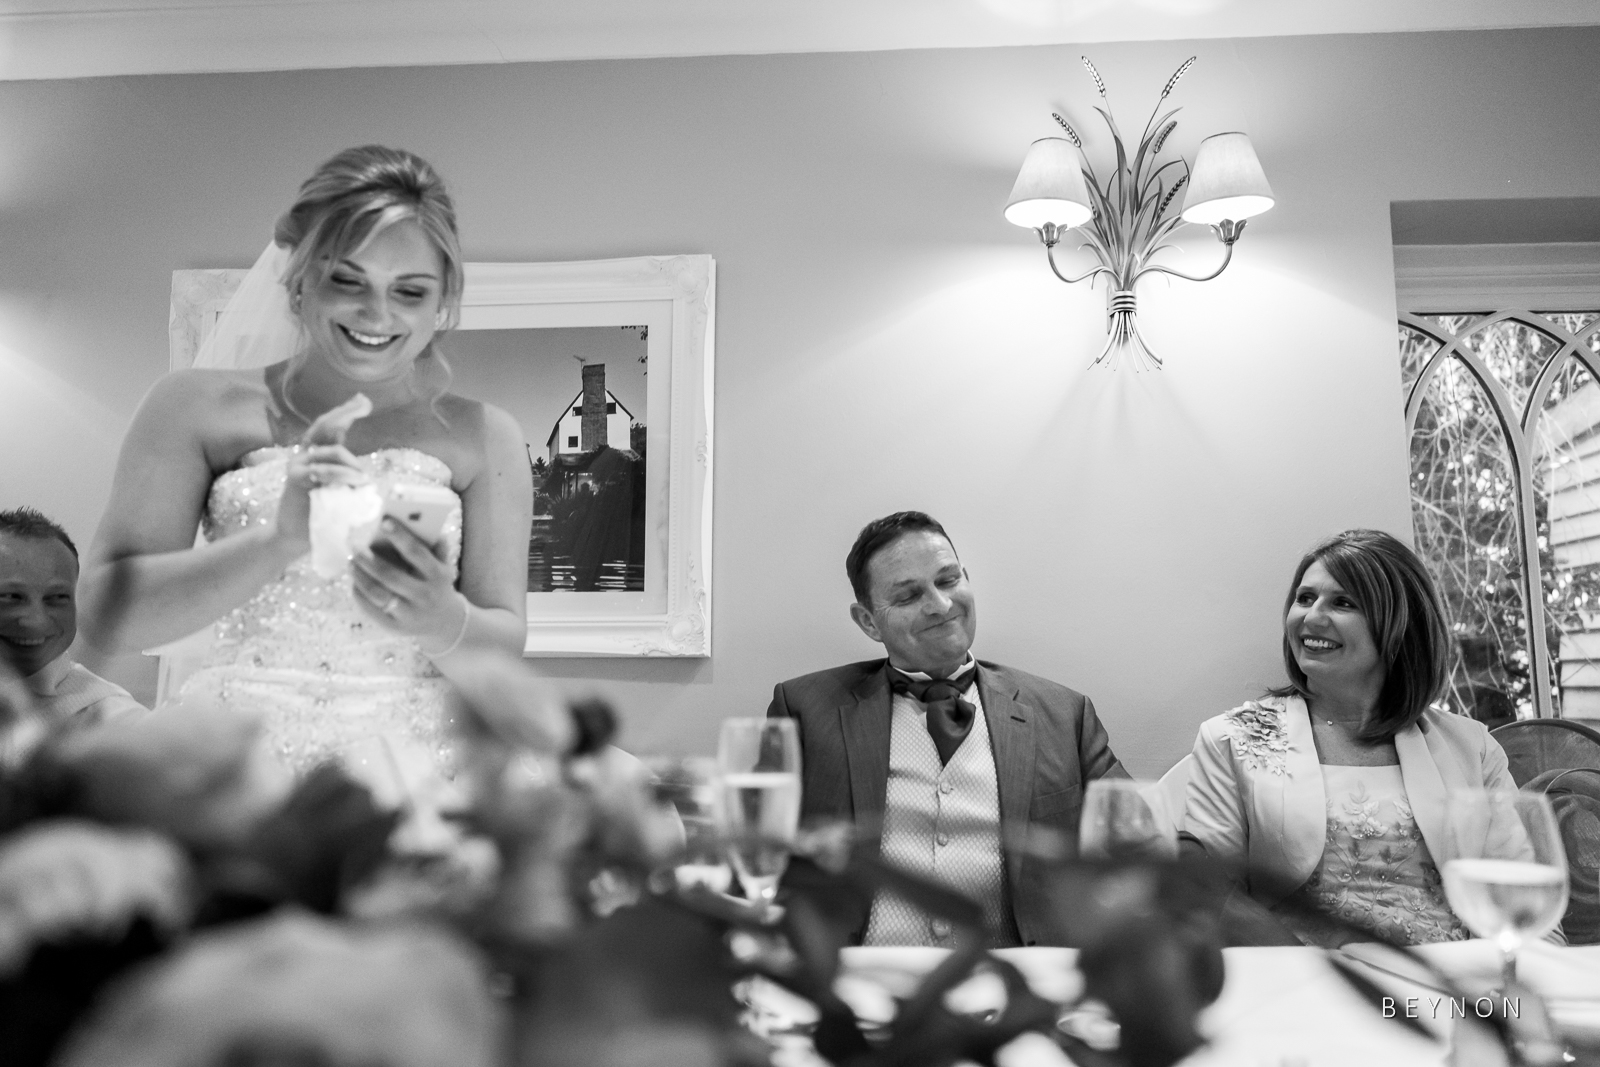 The Bride gives a speech